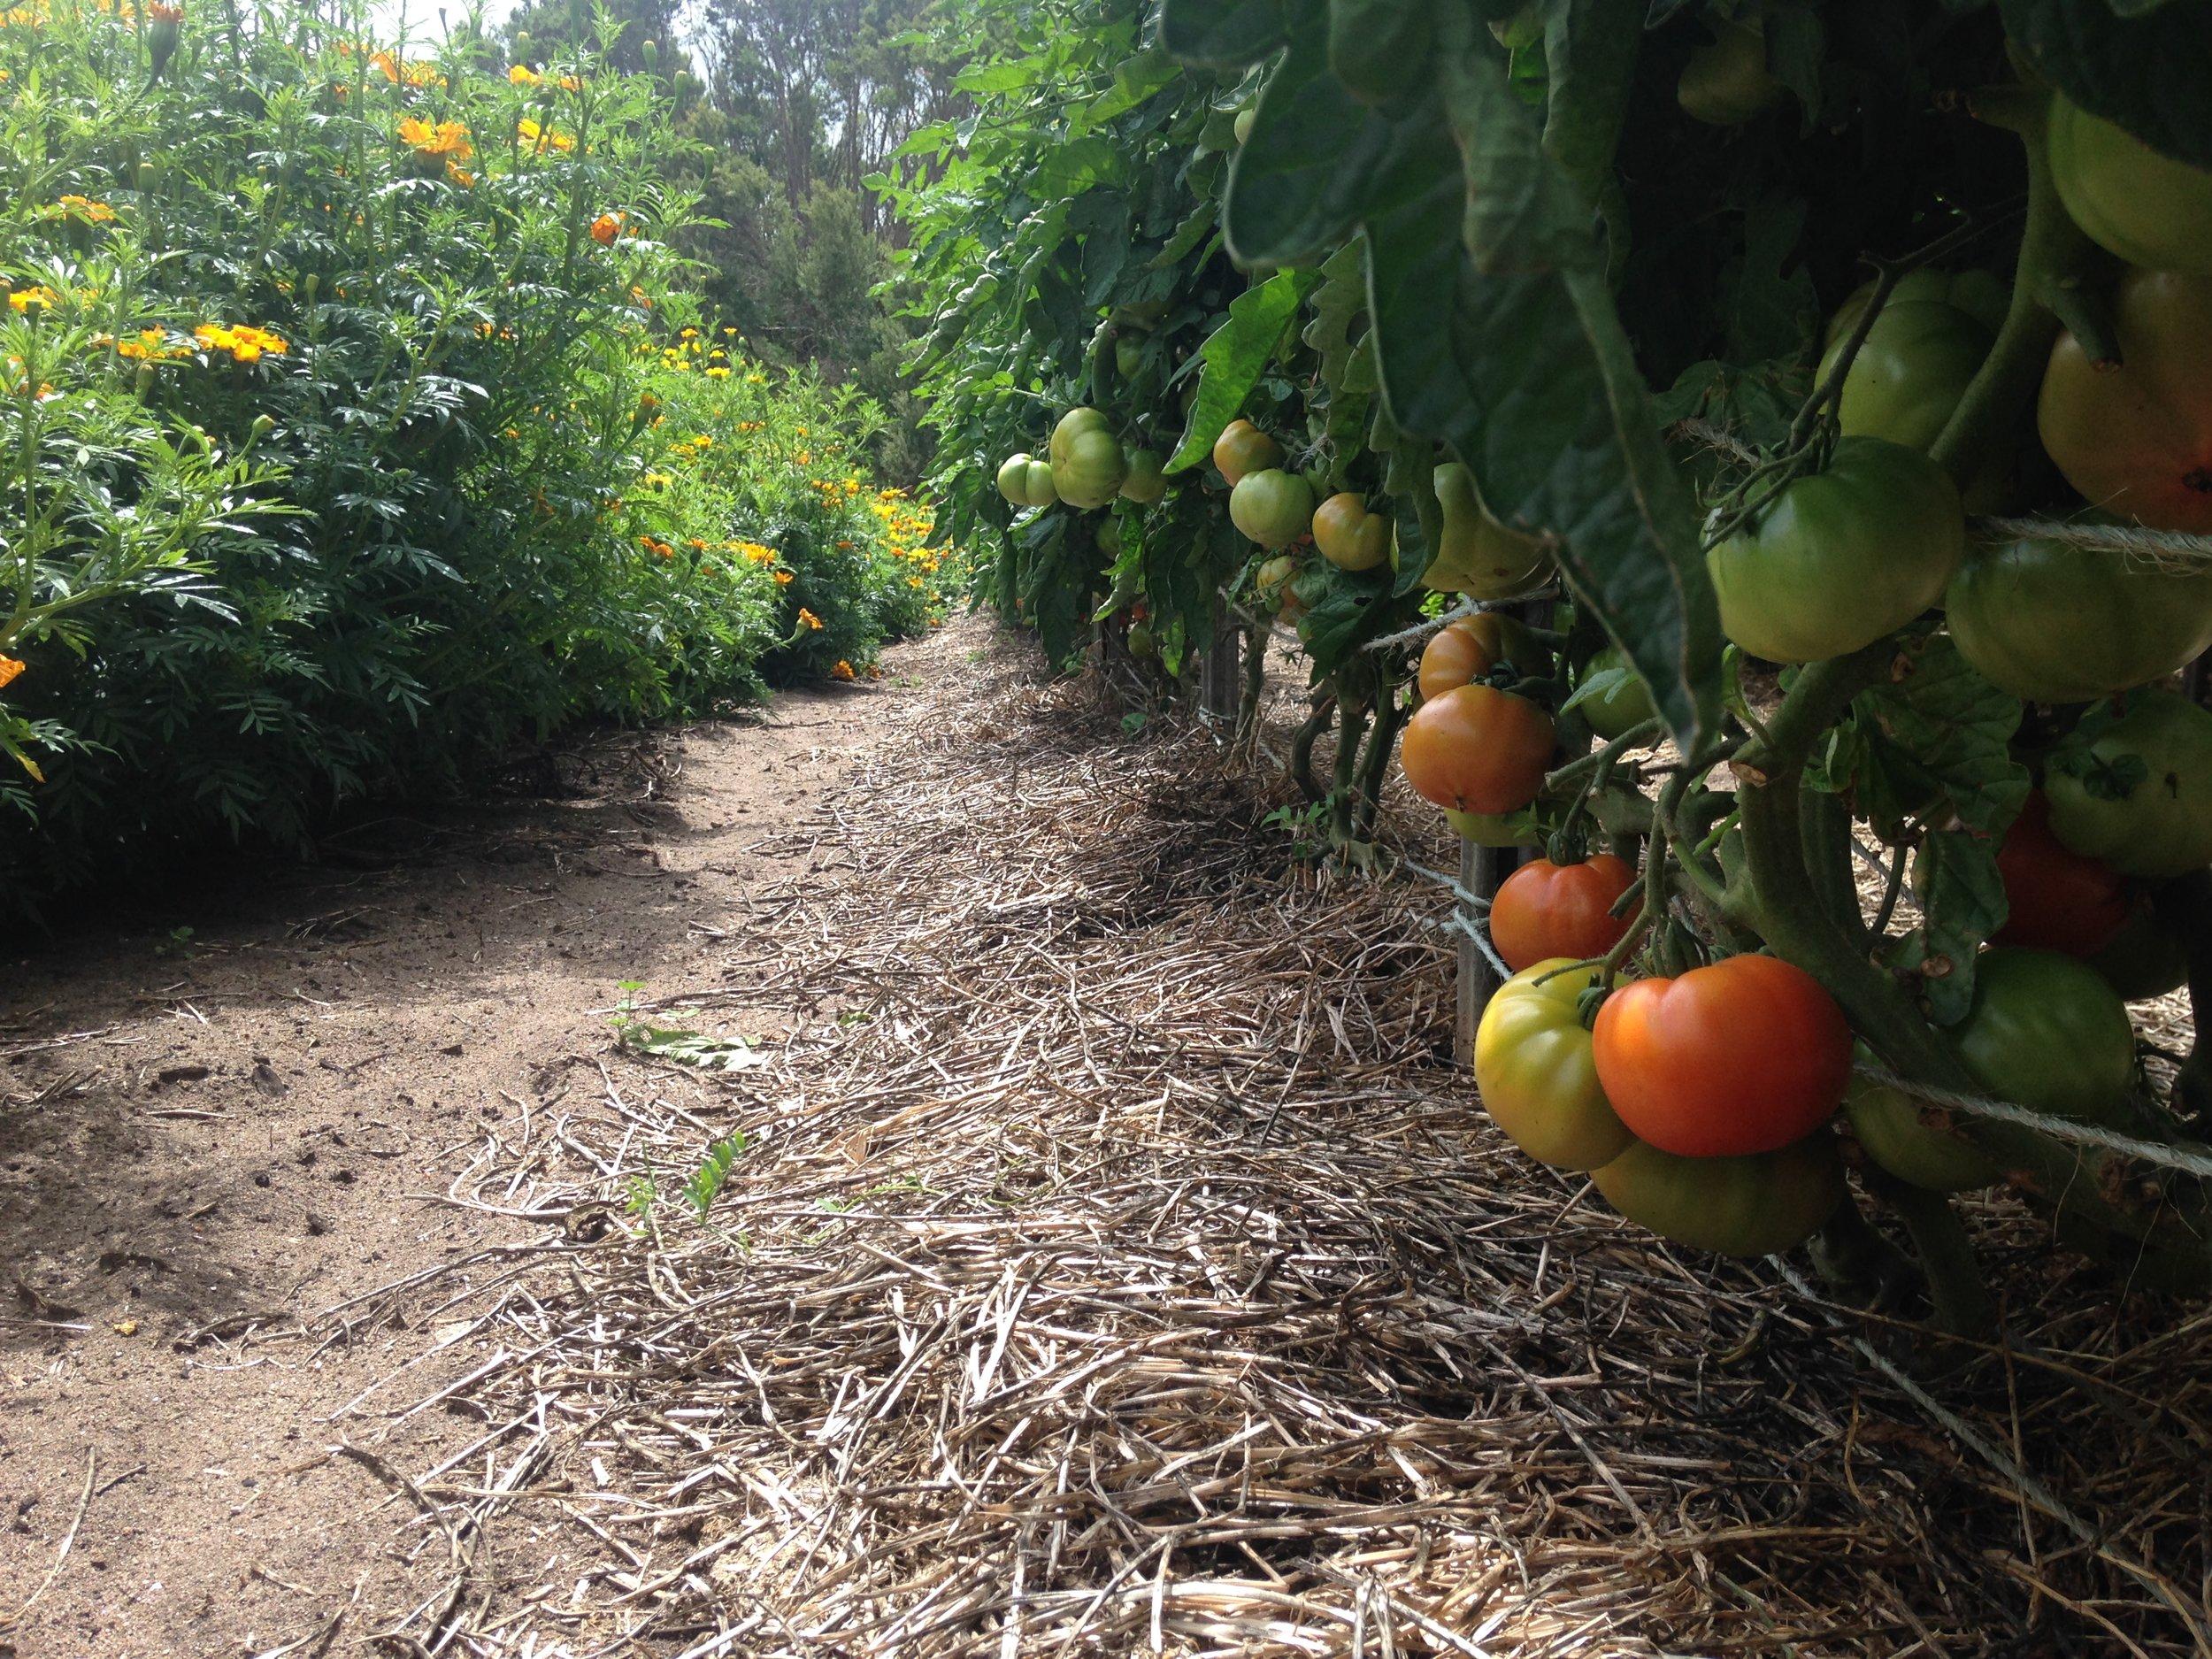 Field tomatoes finally ripening!